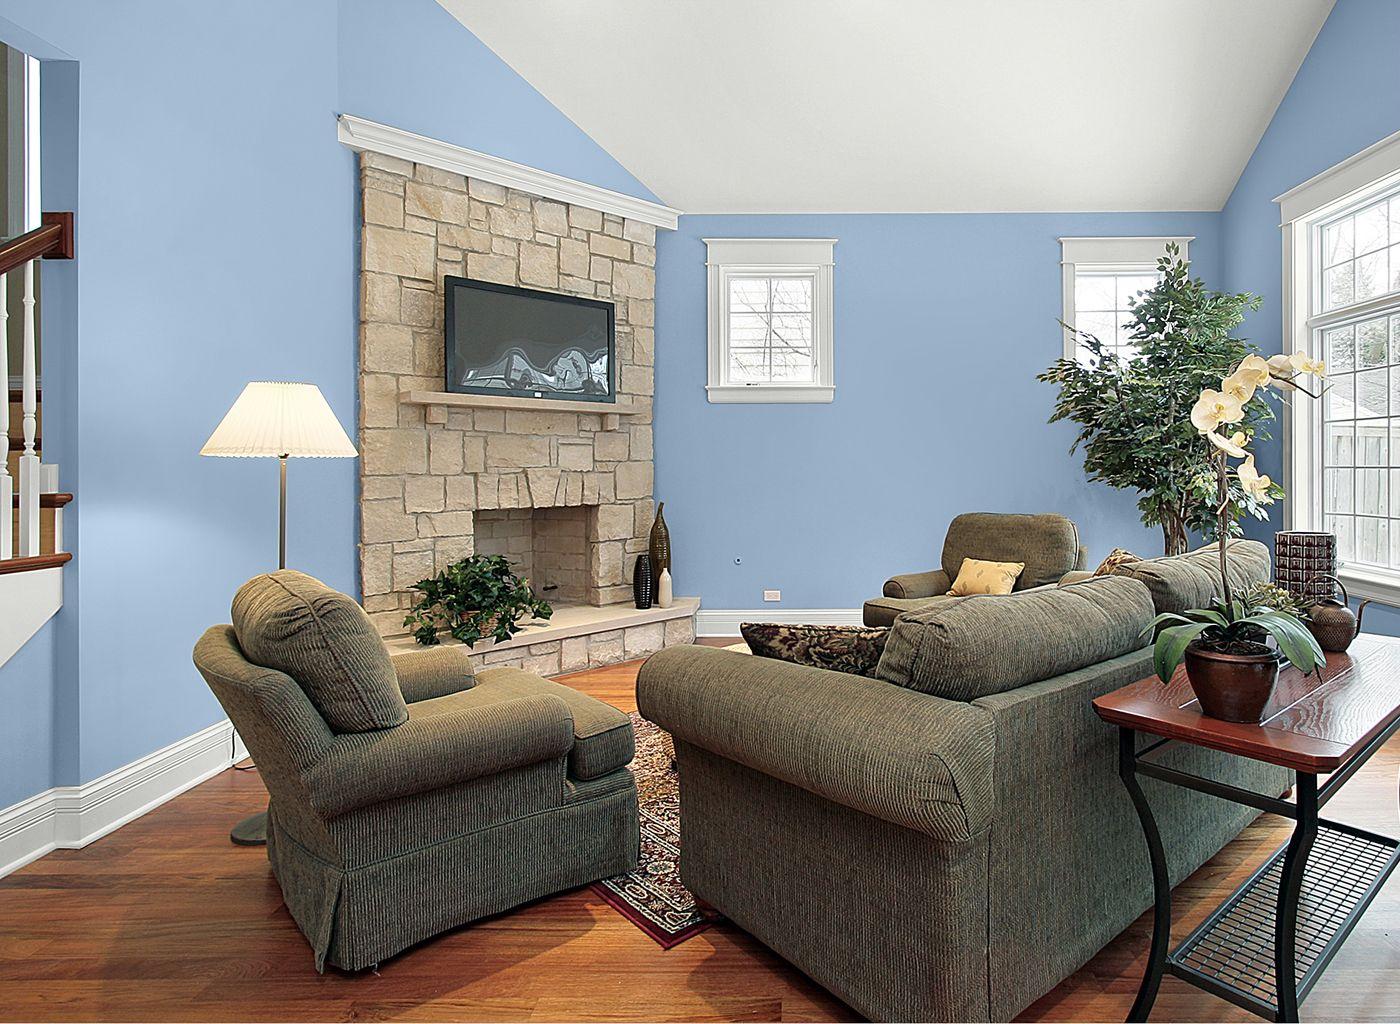 Living Room in Jordan\'s Blue | painted rooms | Pinterest | Living ...